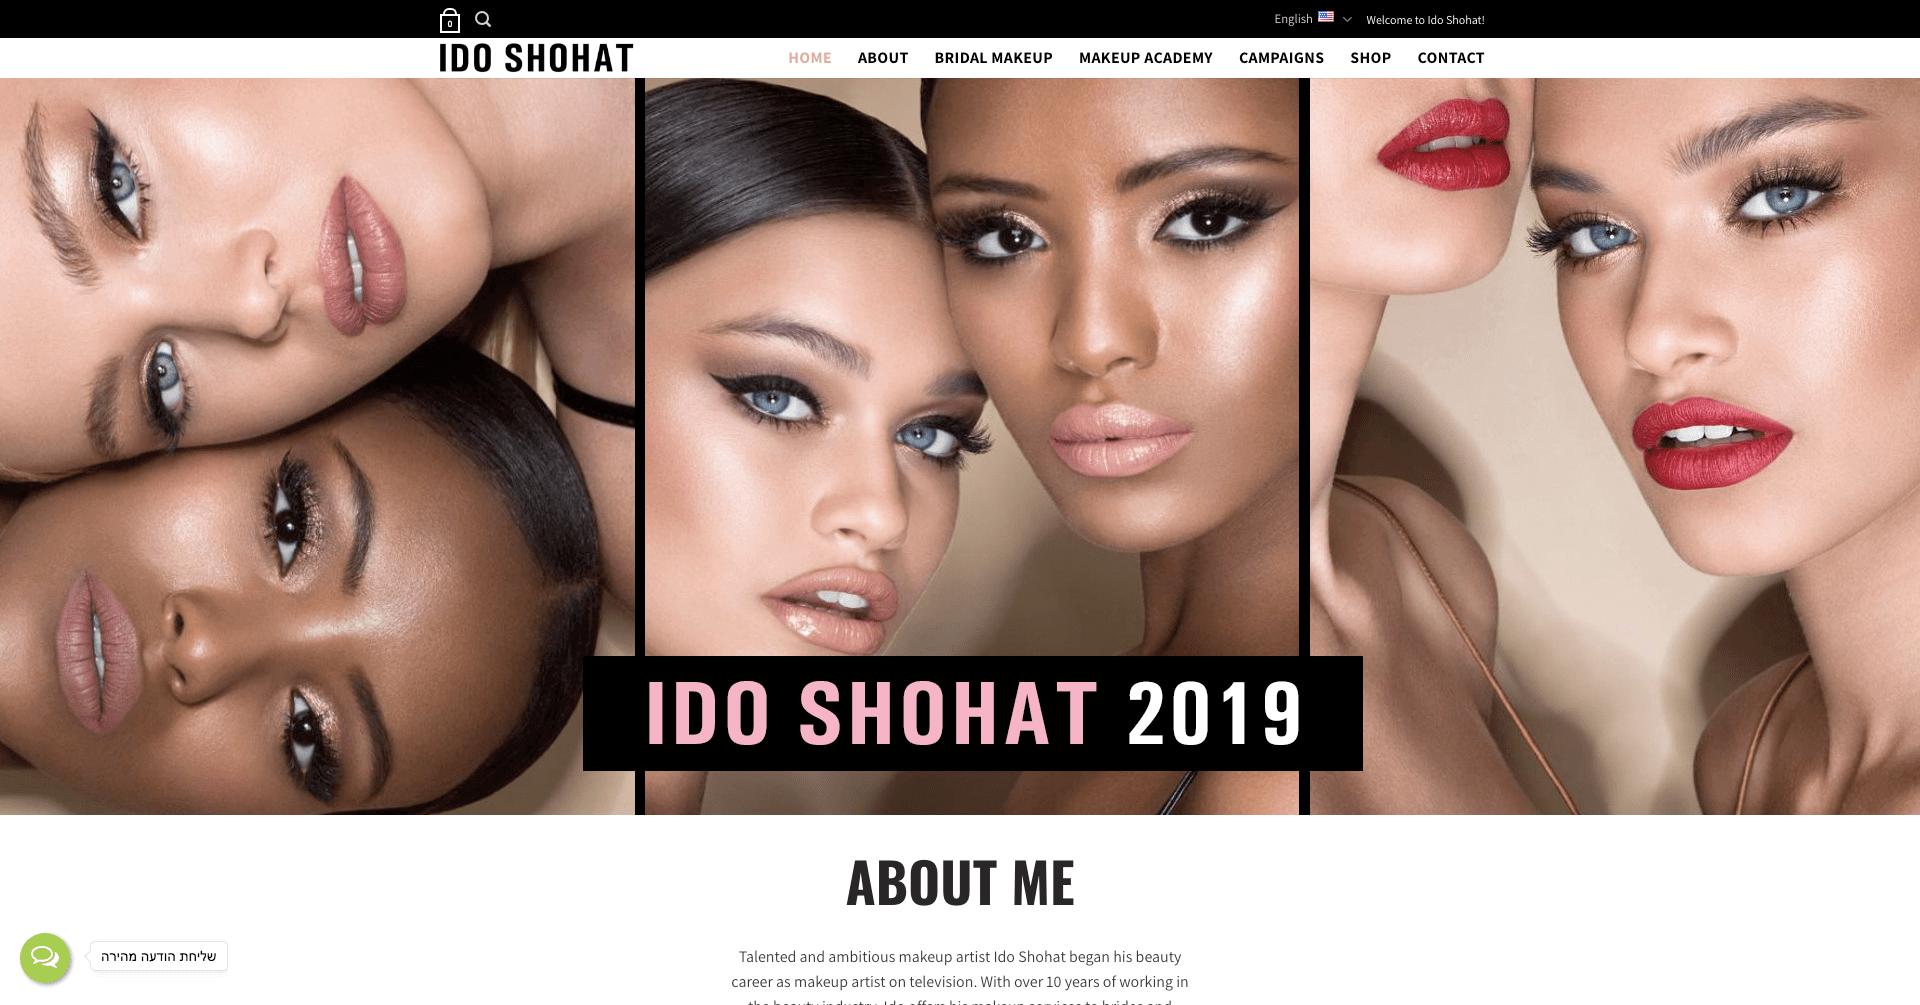 idoshohat.com